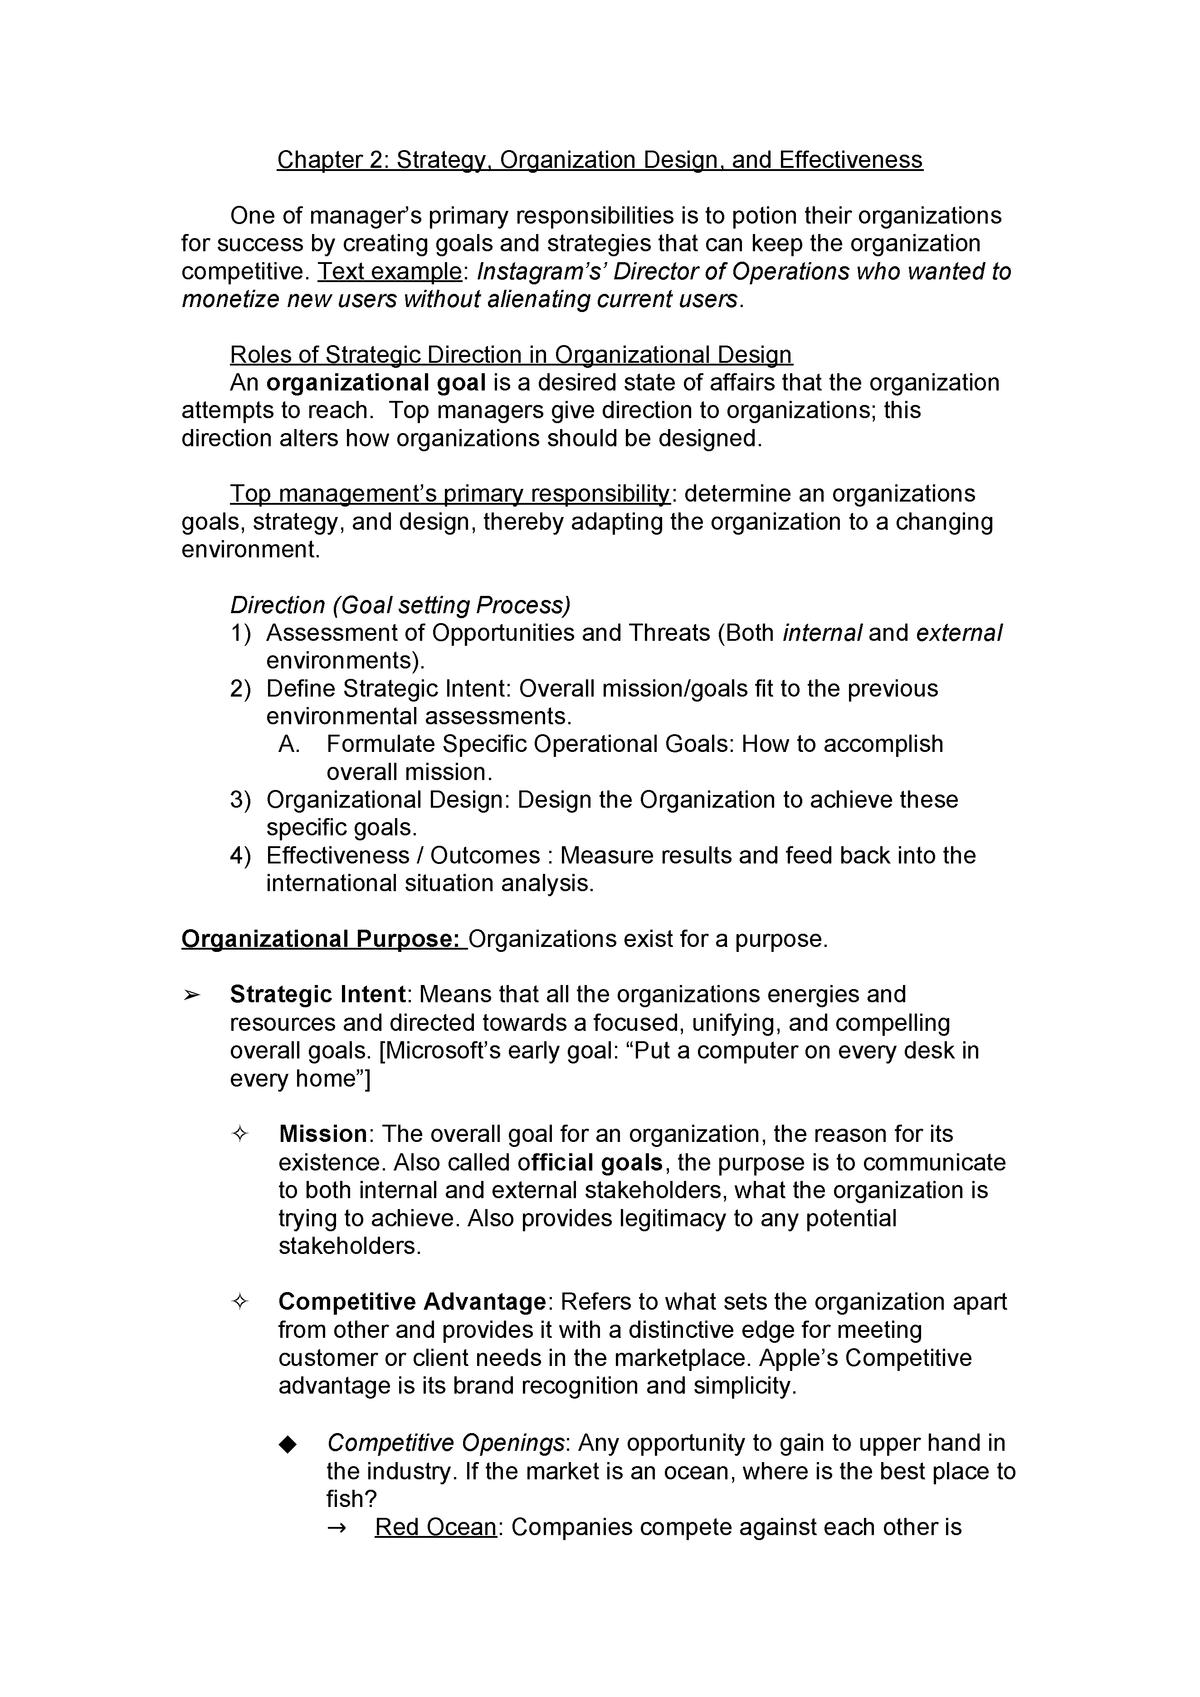 Chapter 2 Strategy Organization Design And Effectiveness Studocu